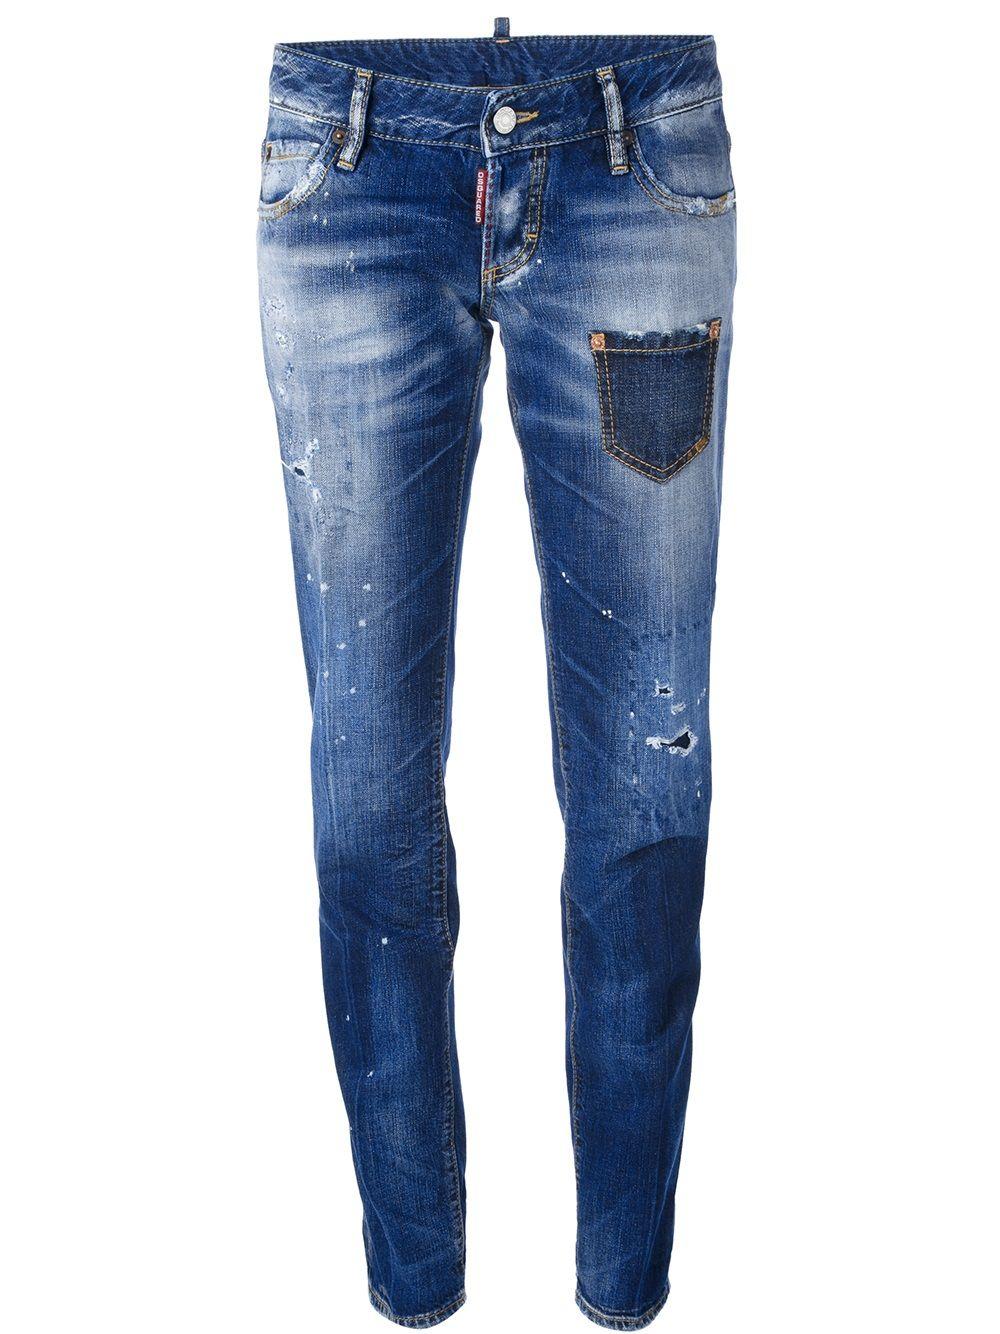 d0b1387b21a Dsquared2 Distressed Whiskering Jeans - Vitkac - Farfetch.com ...